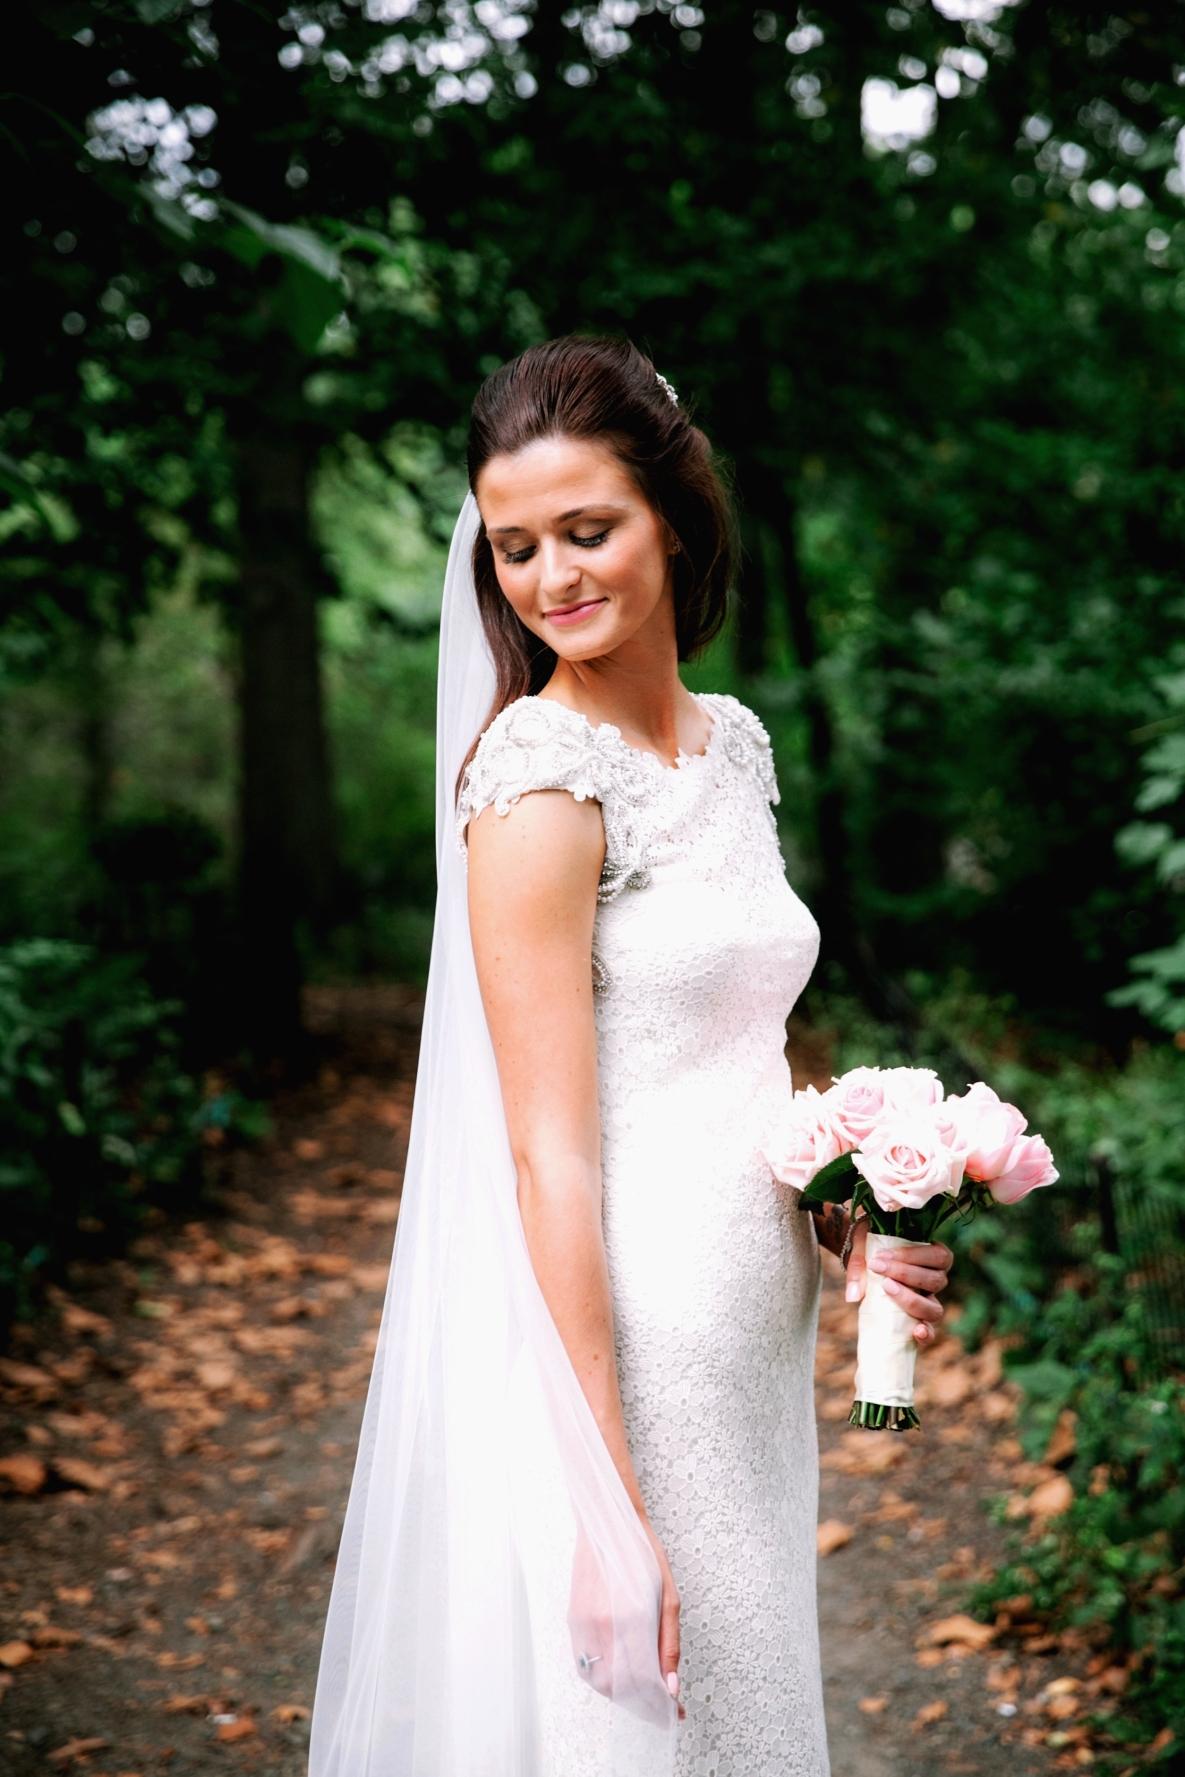 Central_park_wedding_MB-4